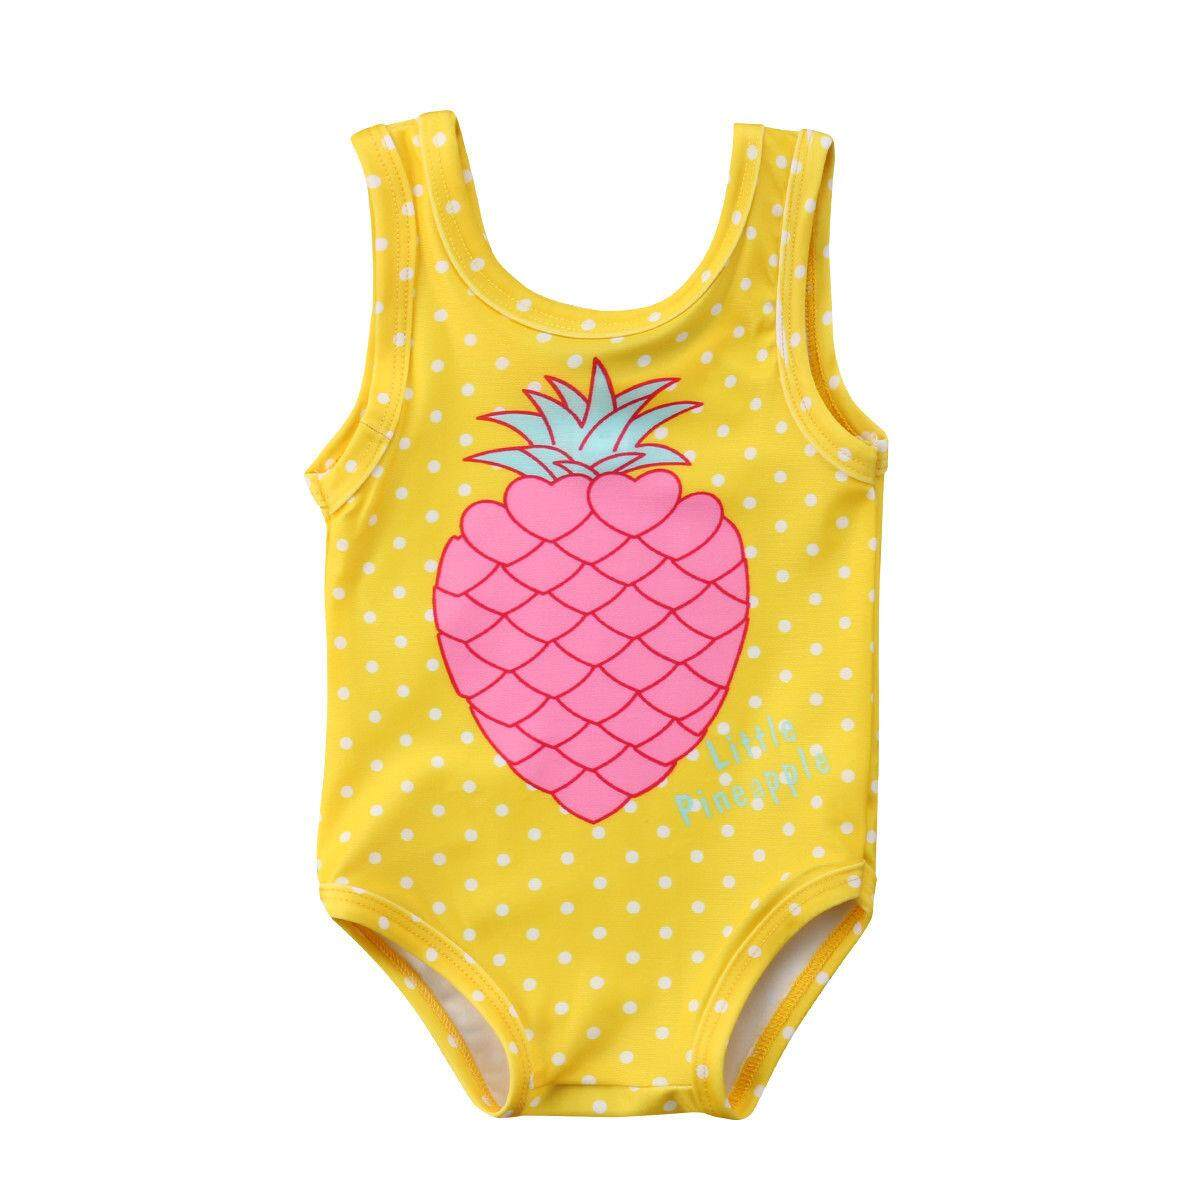 15db4b1da771 2018 New Cute Kids Girl Pineapple Fruit Swimwear Children Girls One pieces Bathing  Suits Toddler Swimsuit